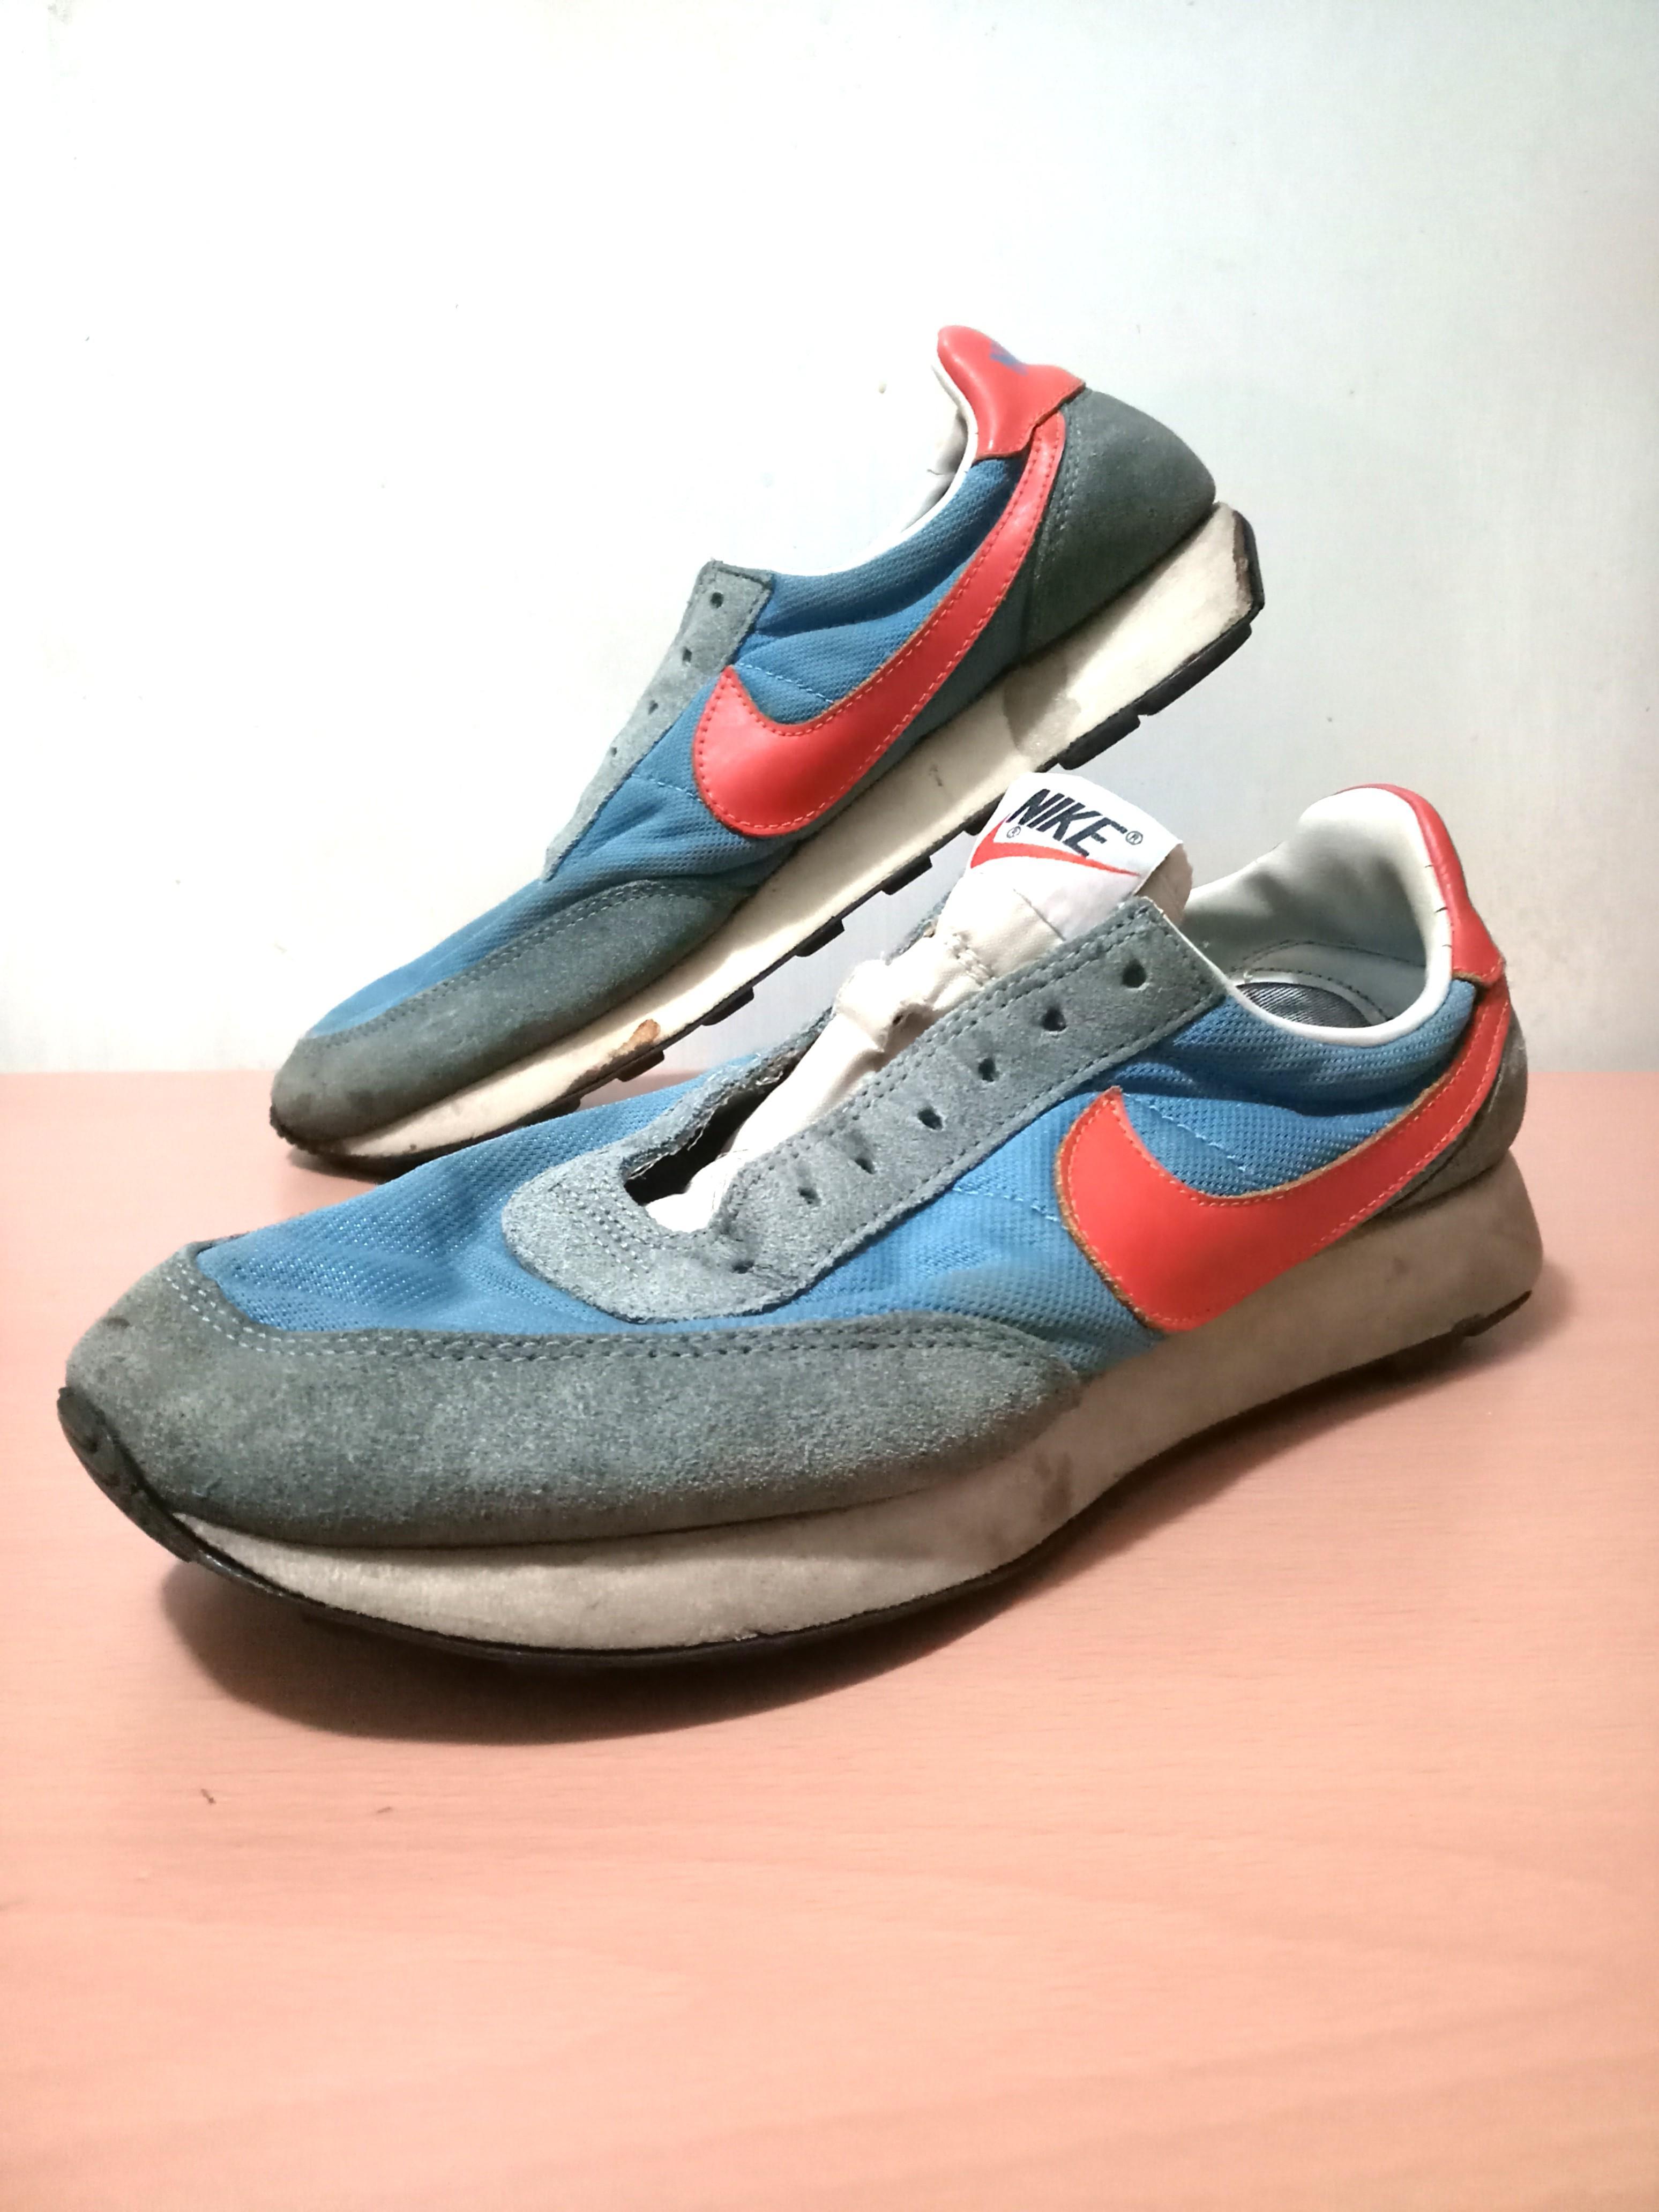 Vintage Nike shoes, Men's Fashion